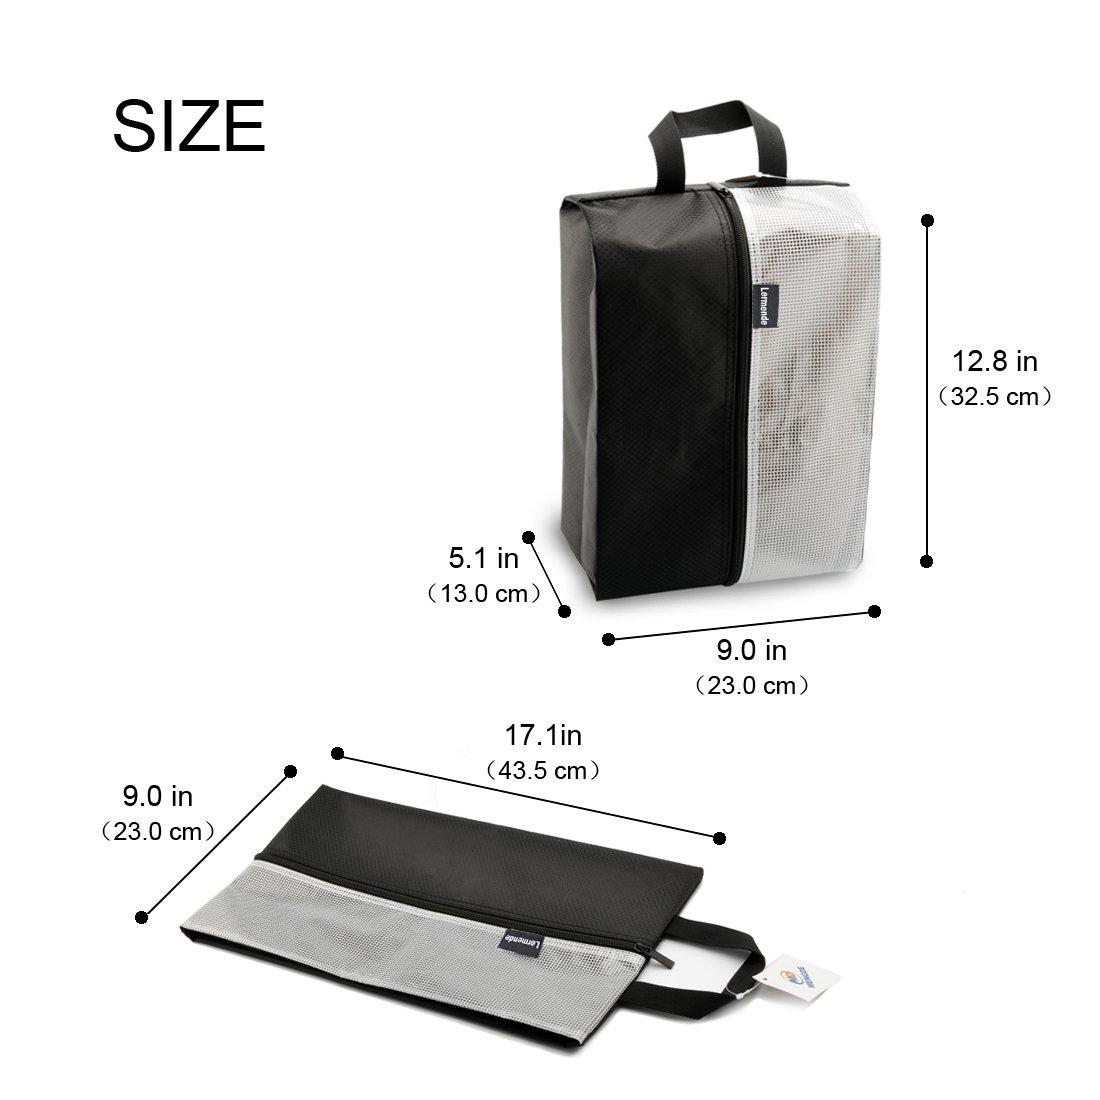 Lermende Travel Shoe Bags Waterproof Nylon Organizer Storage Tote Pouch 5pcs by Lermende (Image #2)